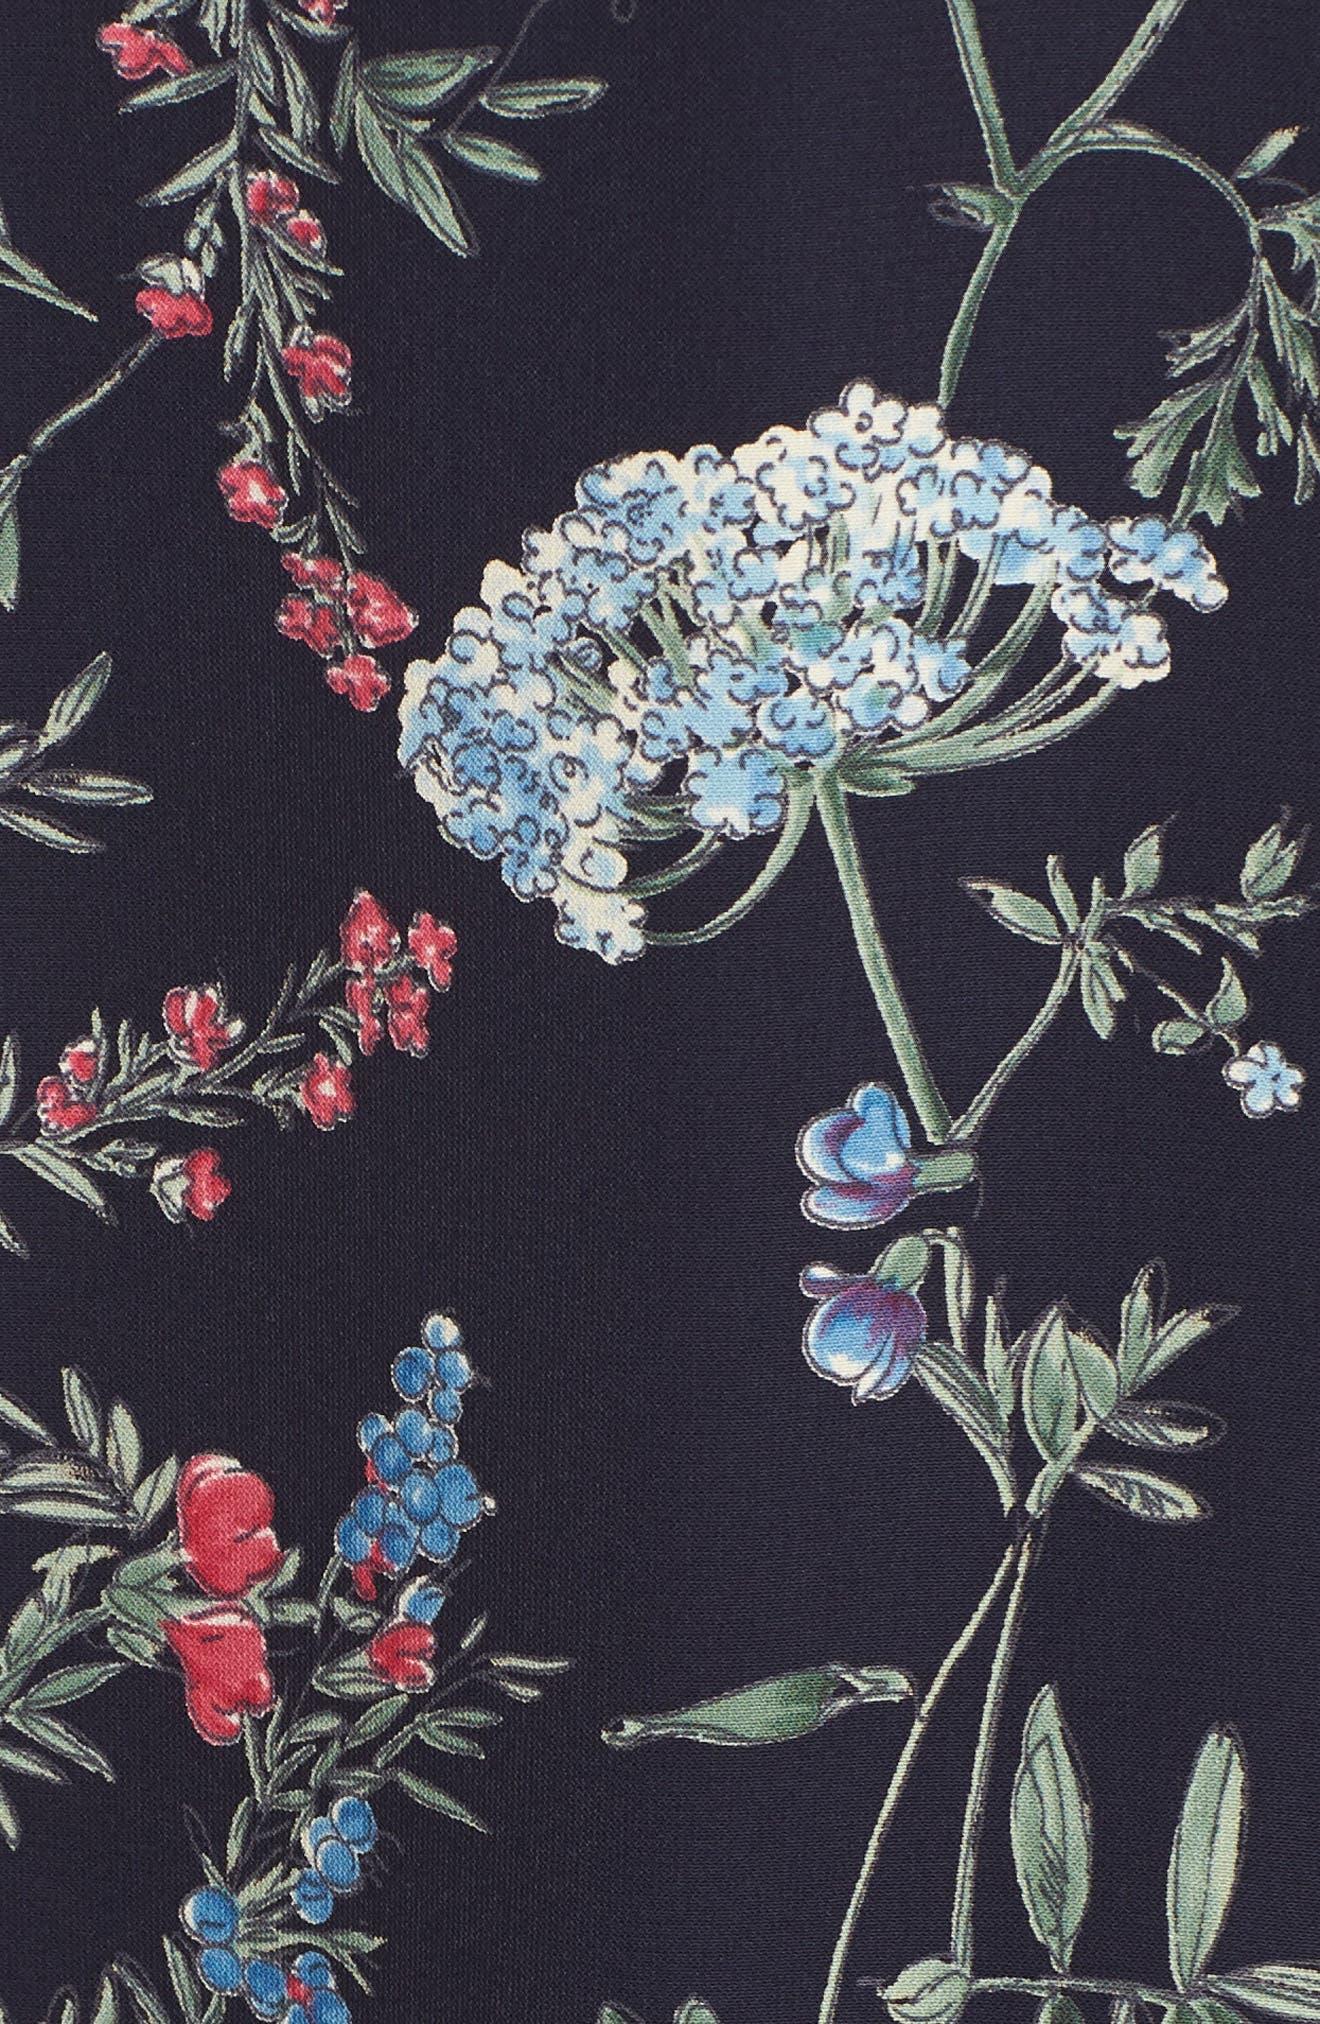 Floral Print Faux Wrap Midi Dress,                             Alternate thumbnail 6, color,                             600